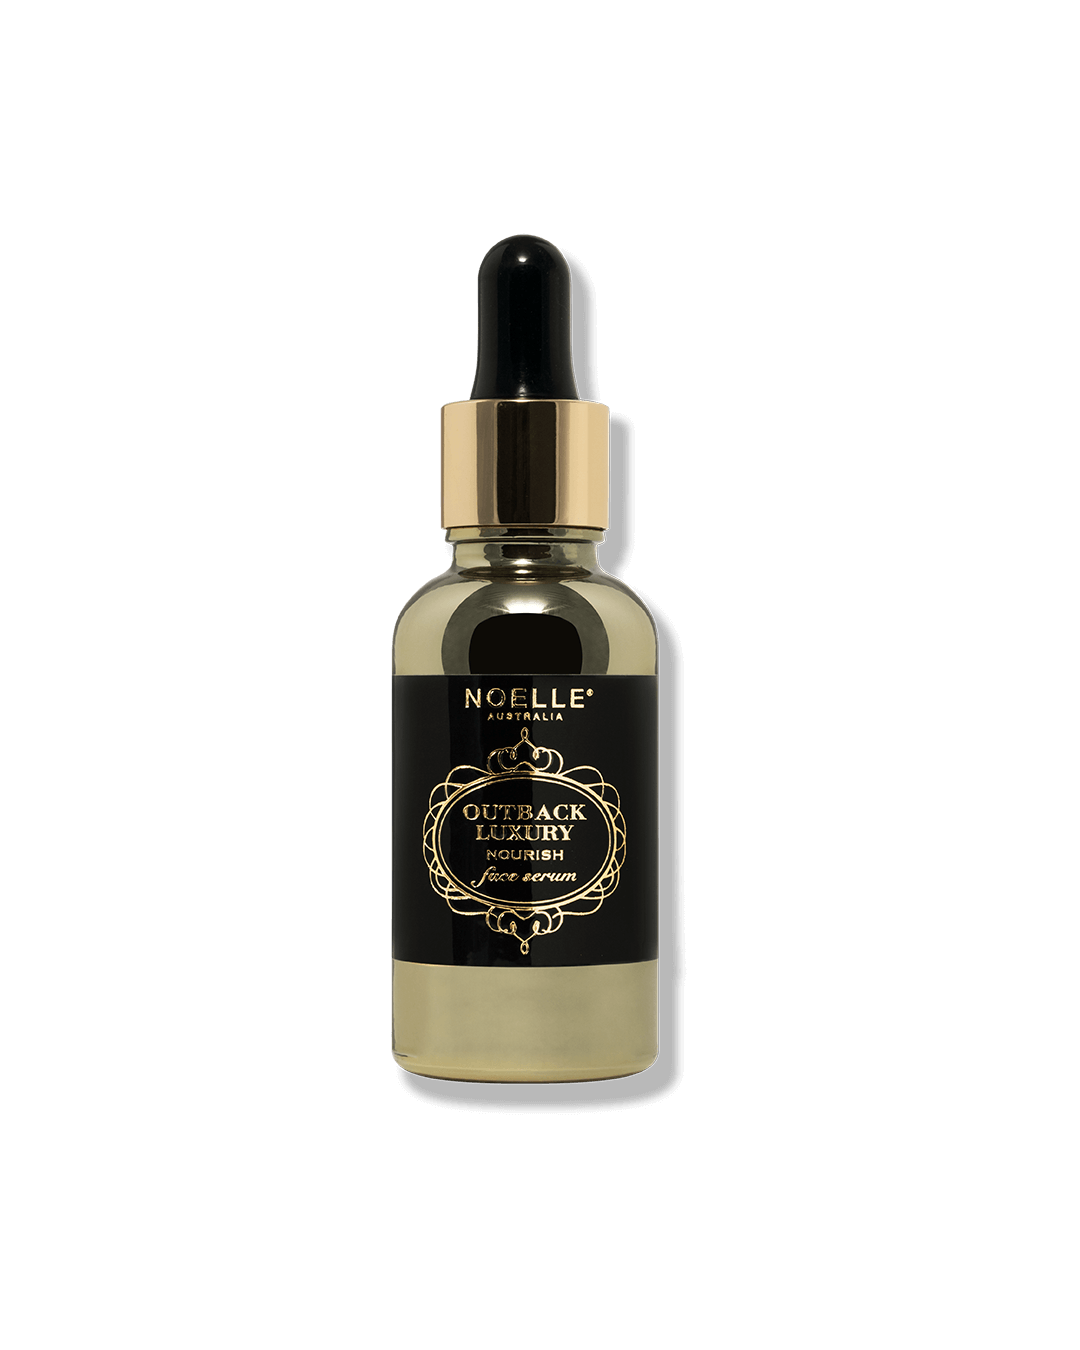 Nourish Face Serum Outback Luxury